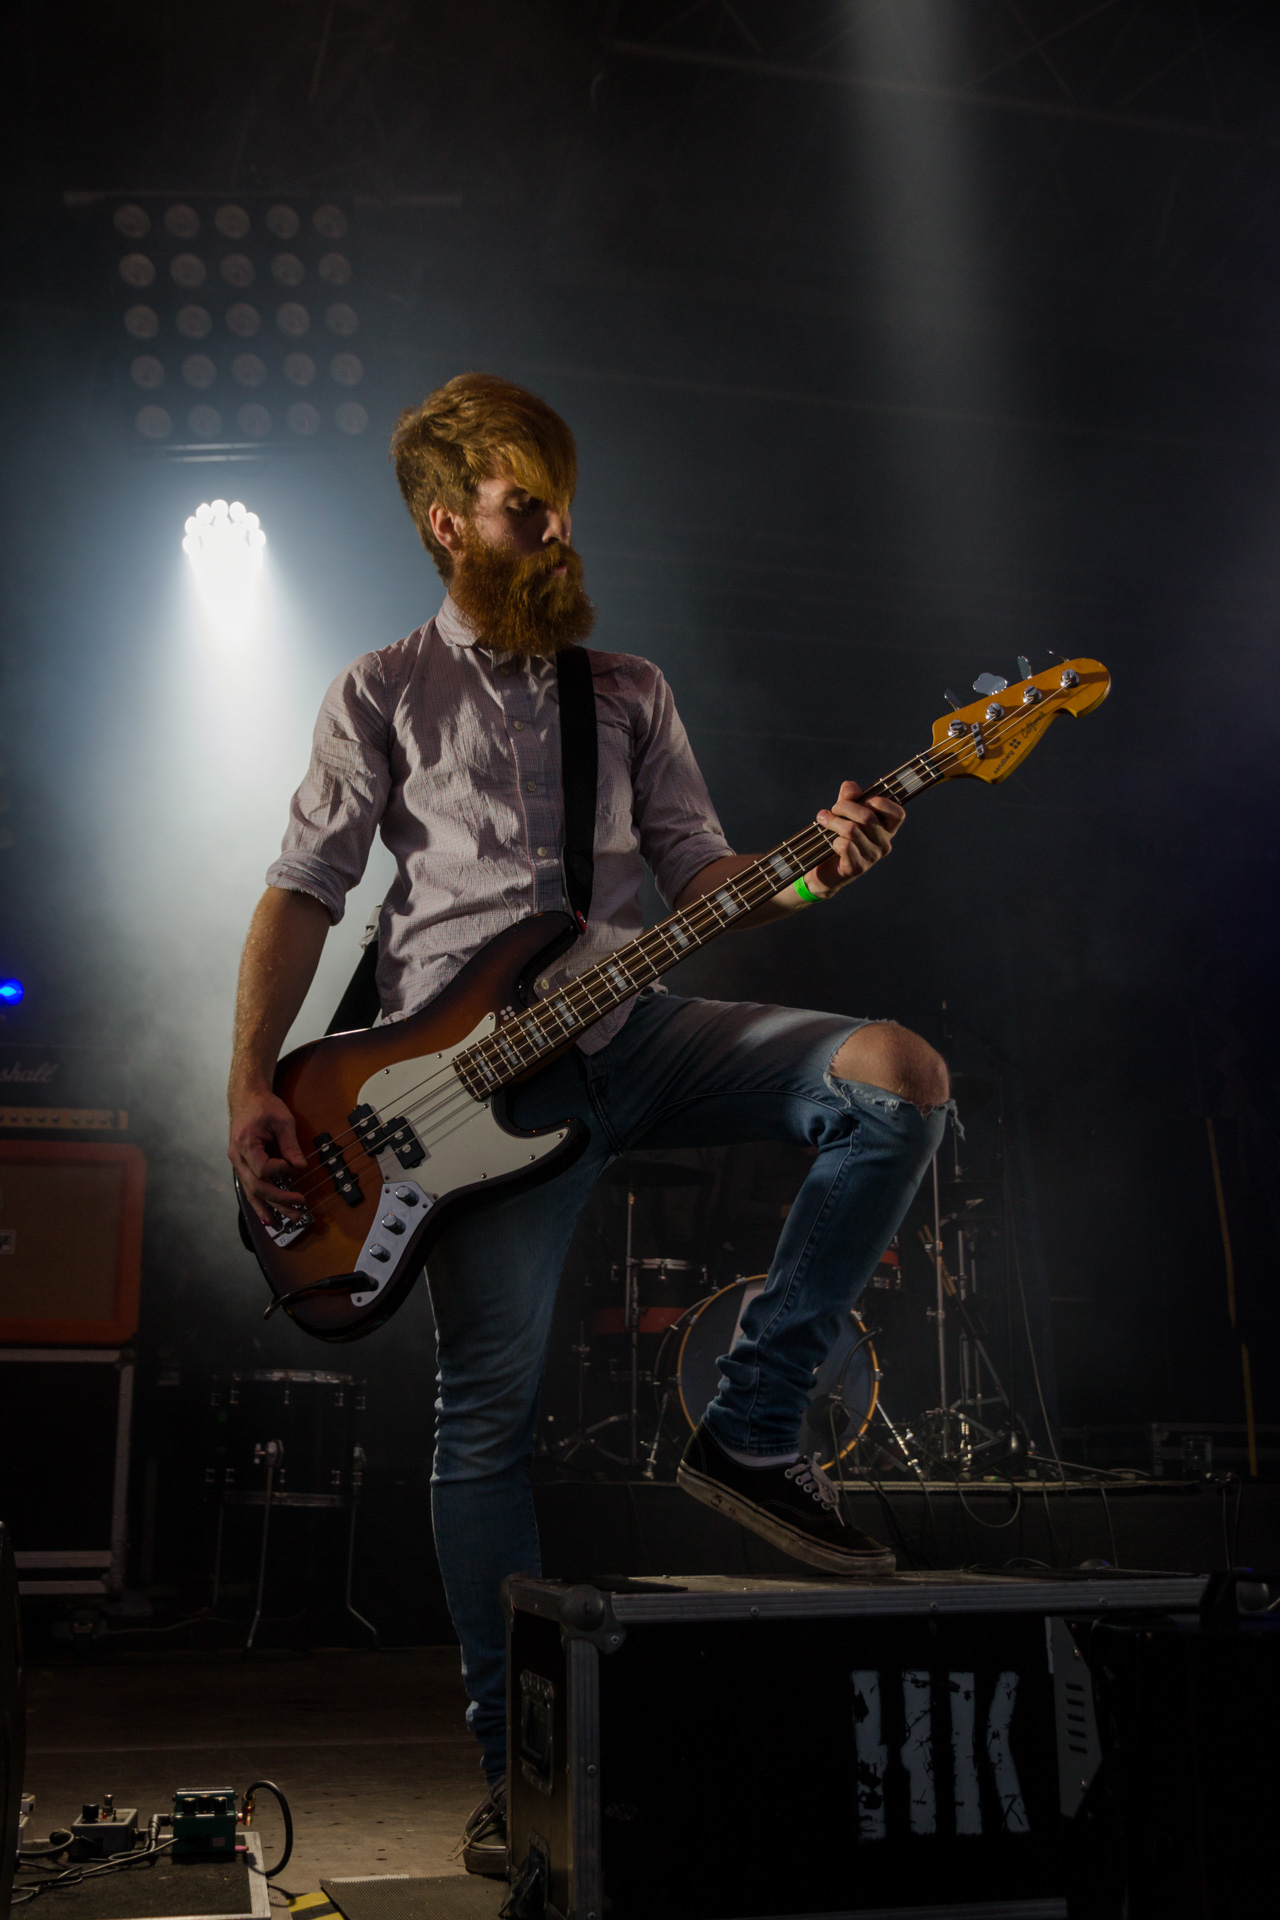 Green Juice Festival 2014 - Heisskalt | Lucas Mayer